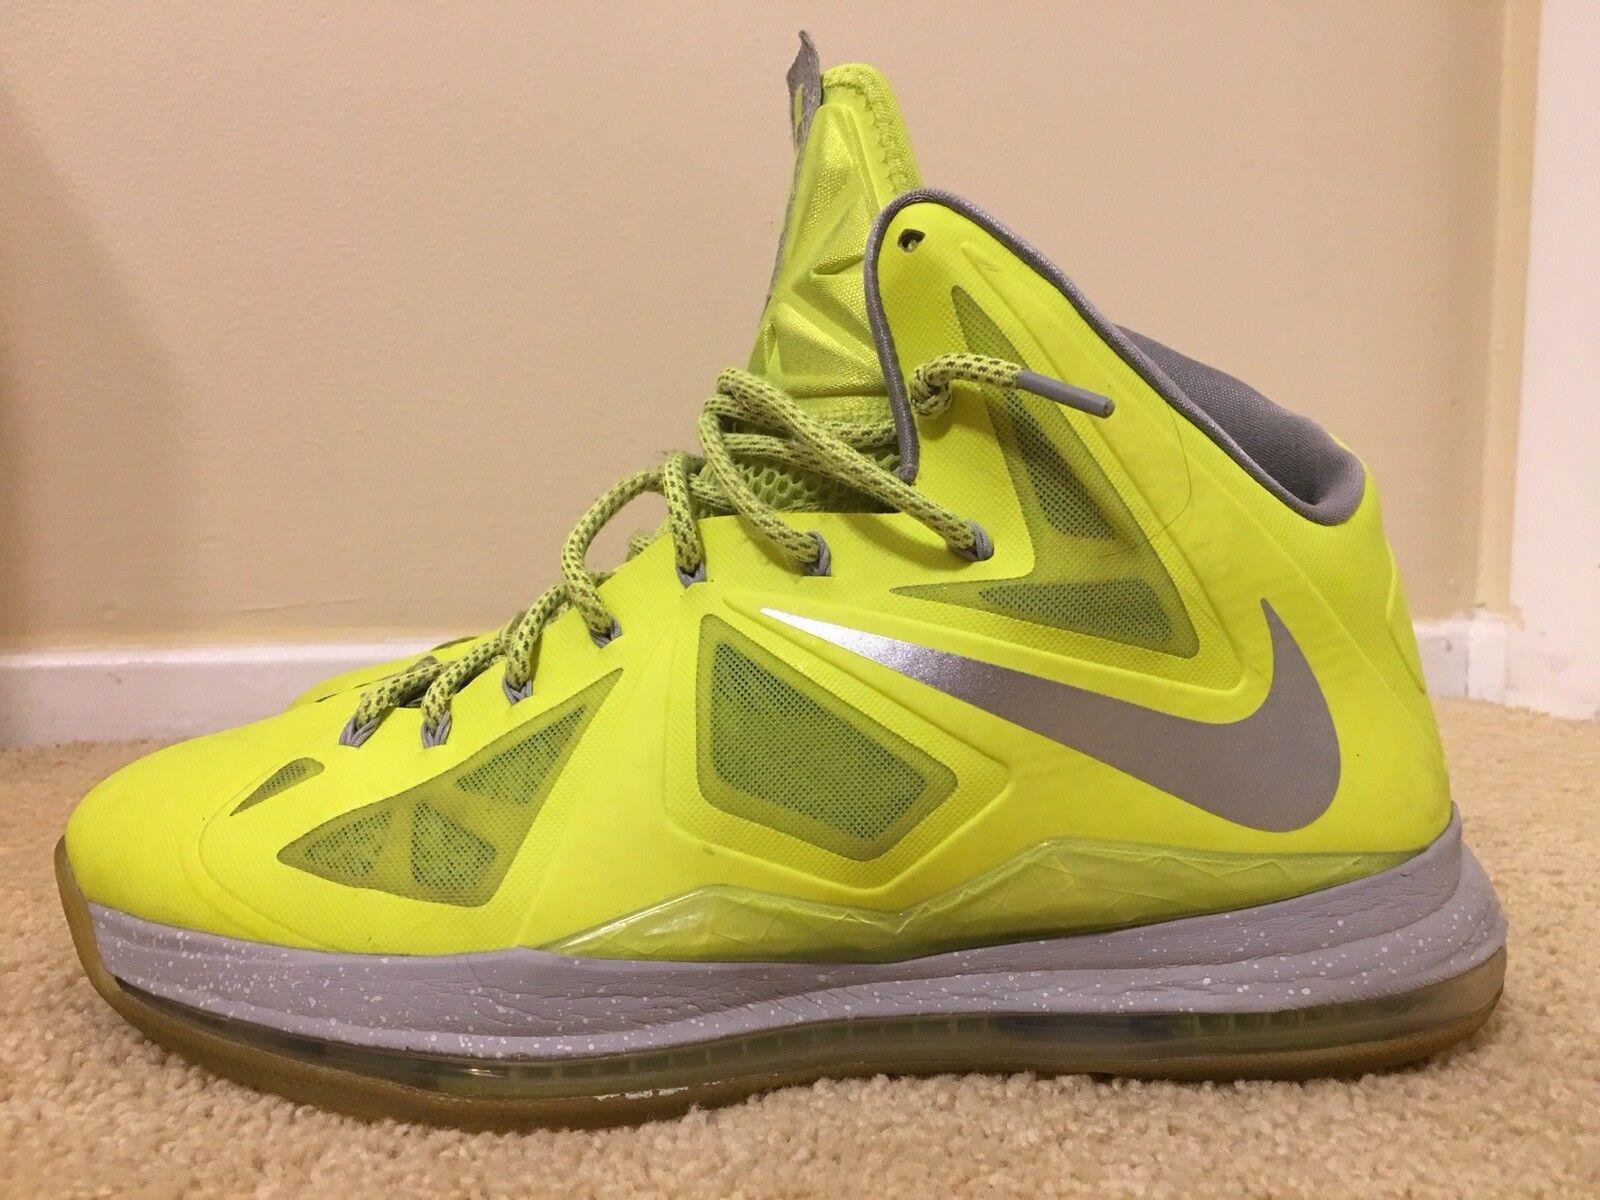 Nike Lebron X 10 Volt Basketball Dunkman, 54201818 700, Hombre Basketball Volt Zapatos , Talla 14 ca4755